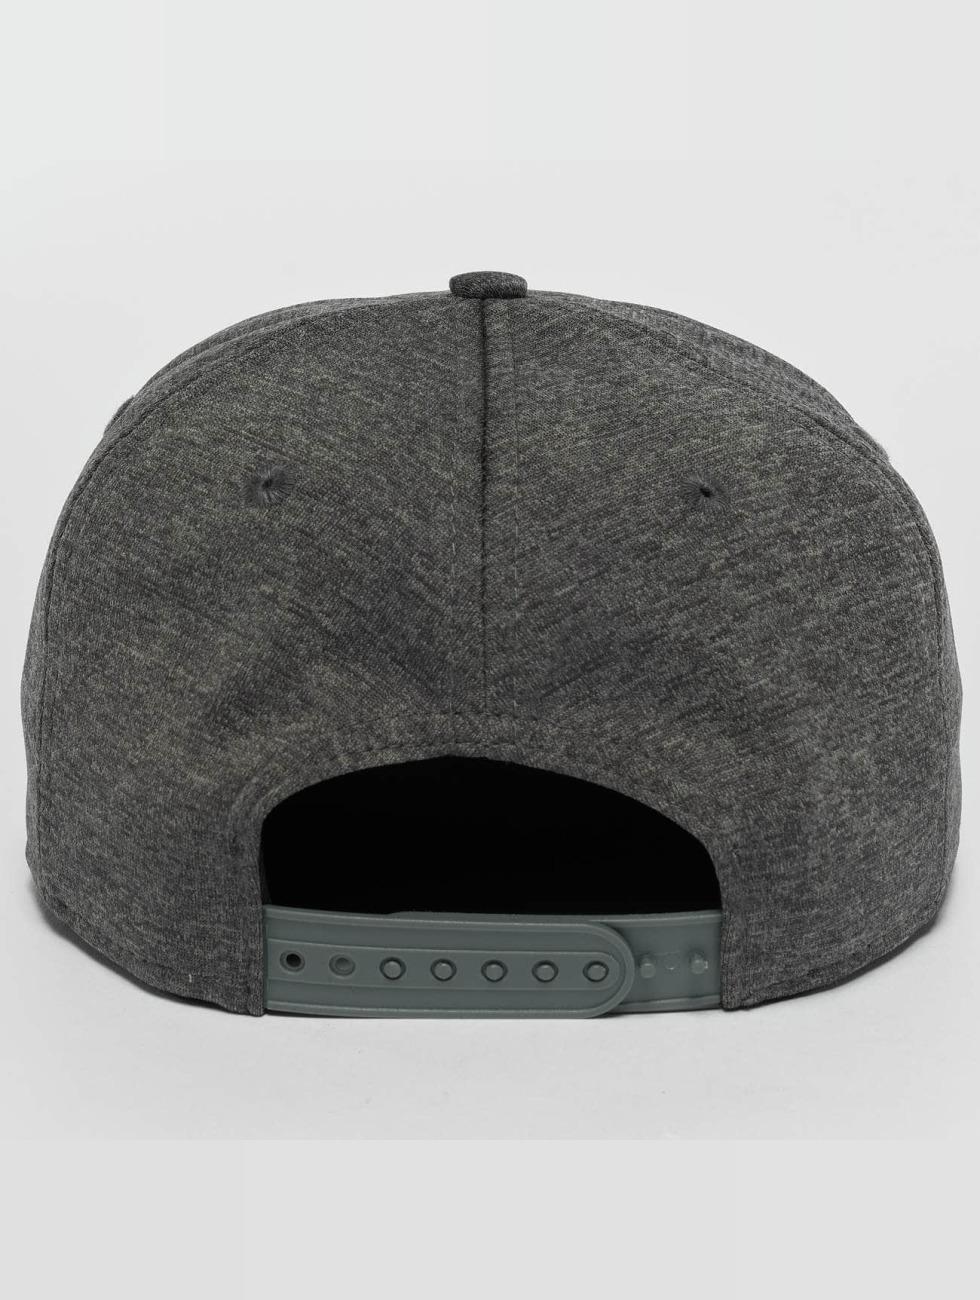 New Era Snapback Cap Concrete Jersey Batman 9Fifty gray